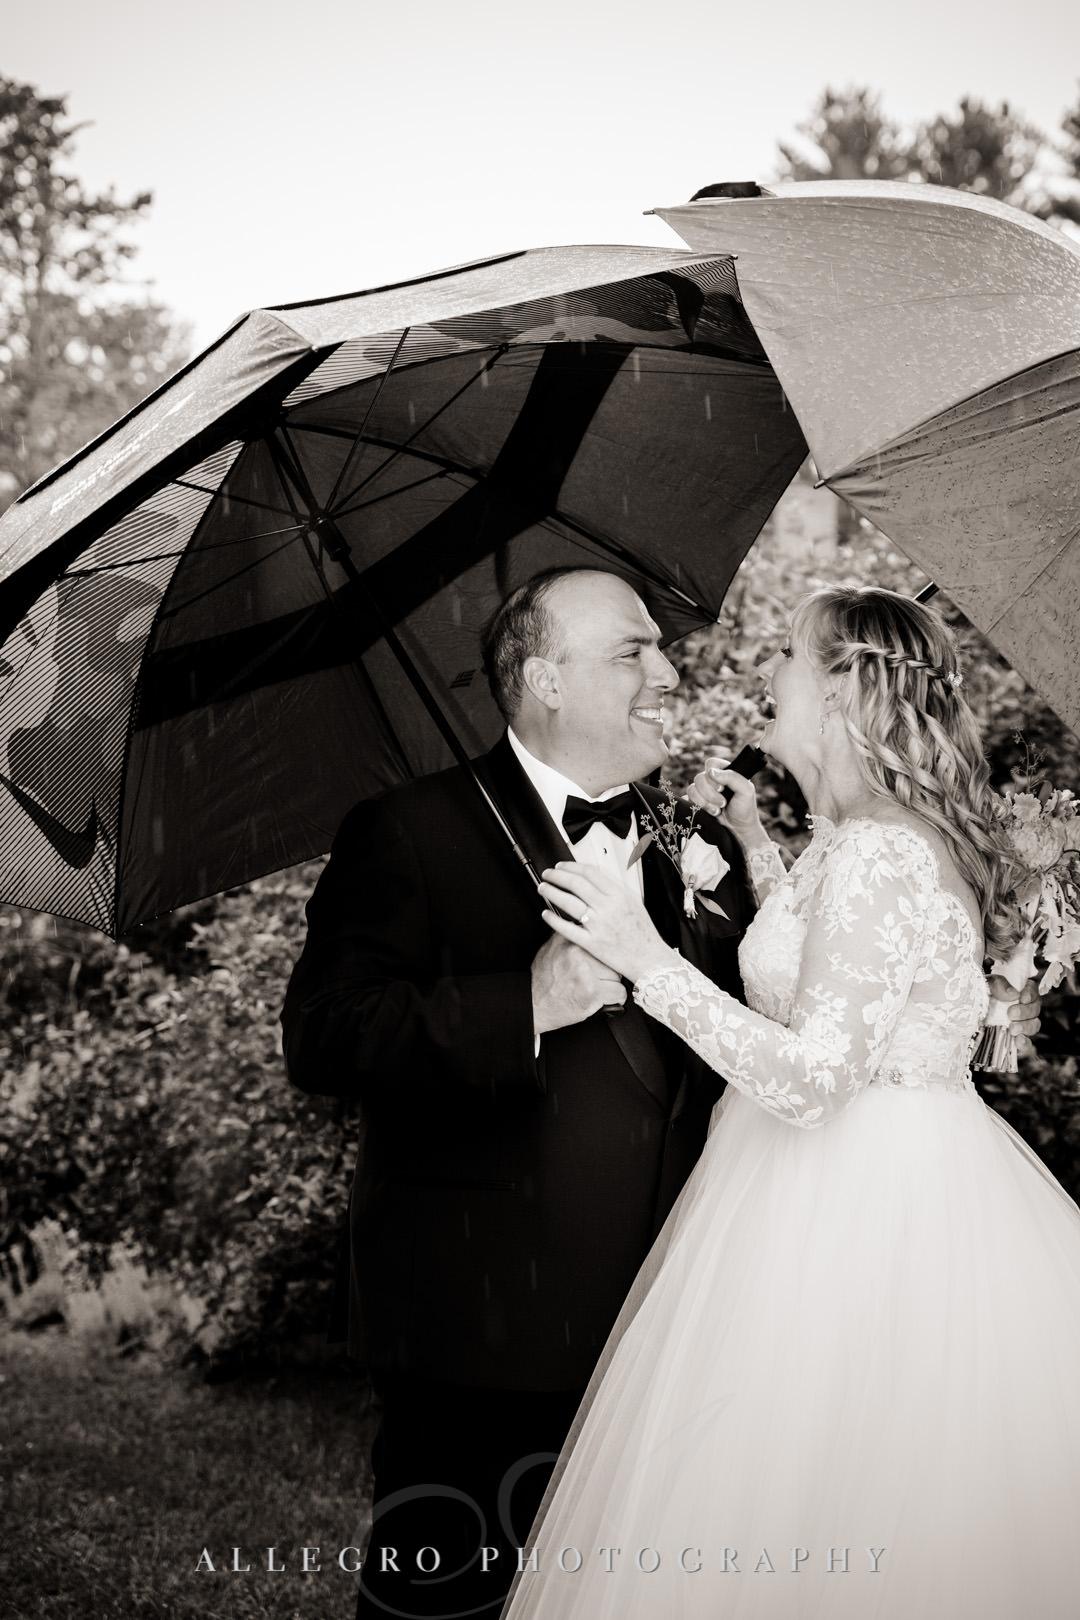 Bride and groom under umbrella | Allegro Photography